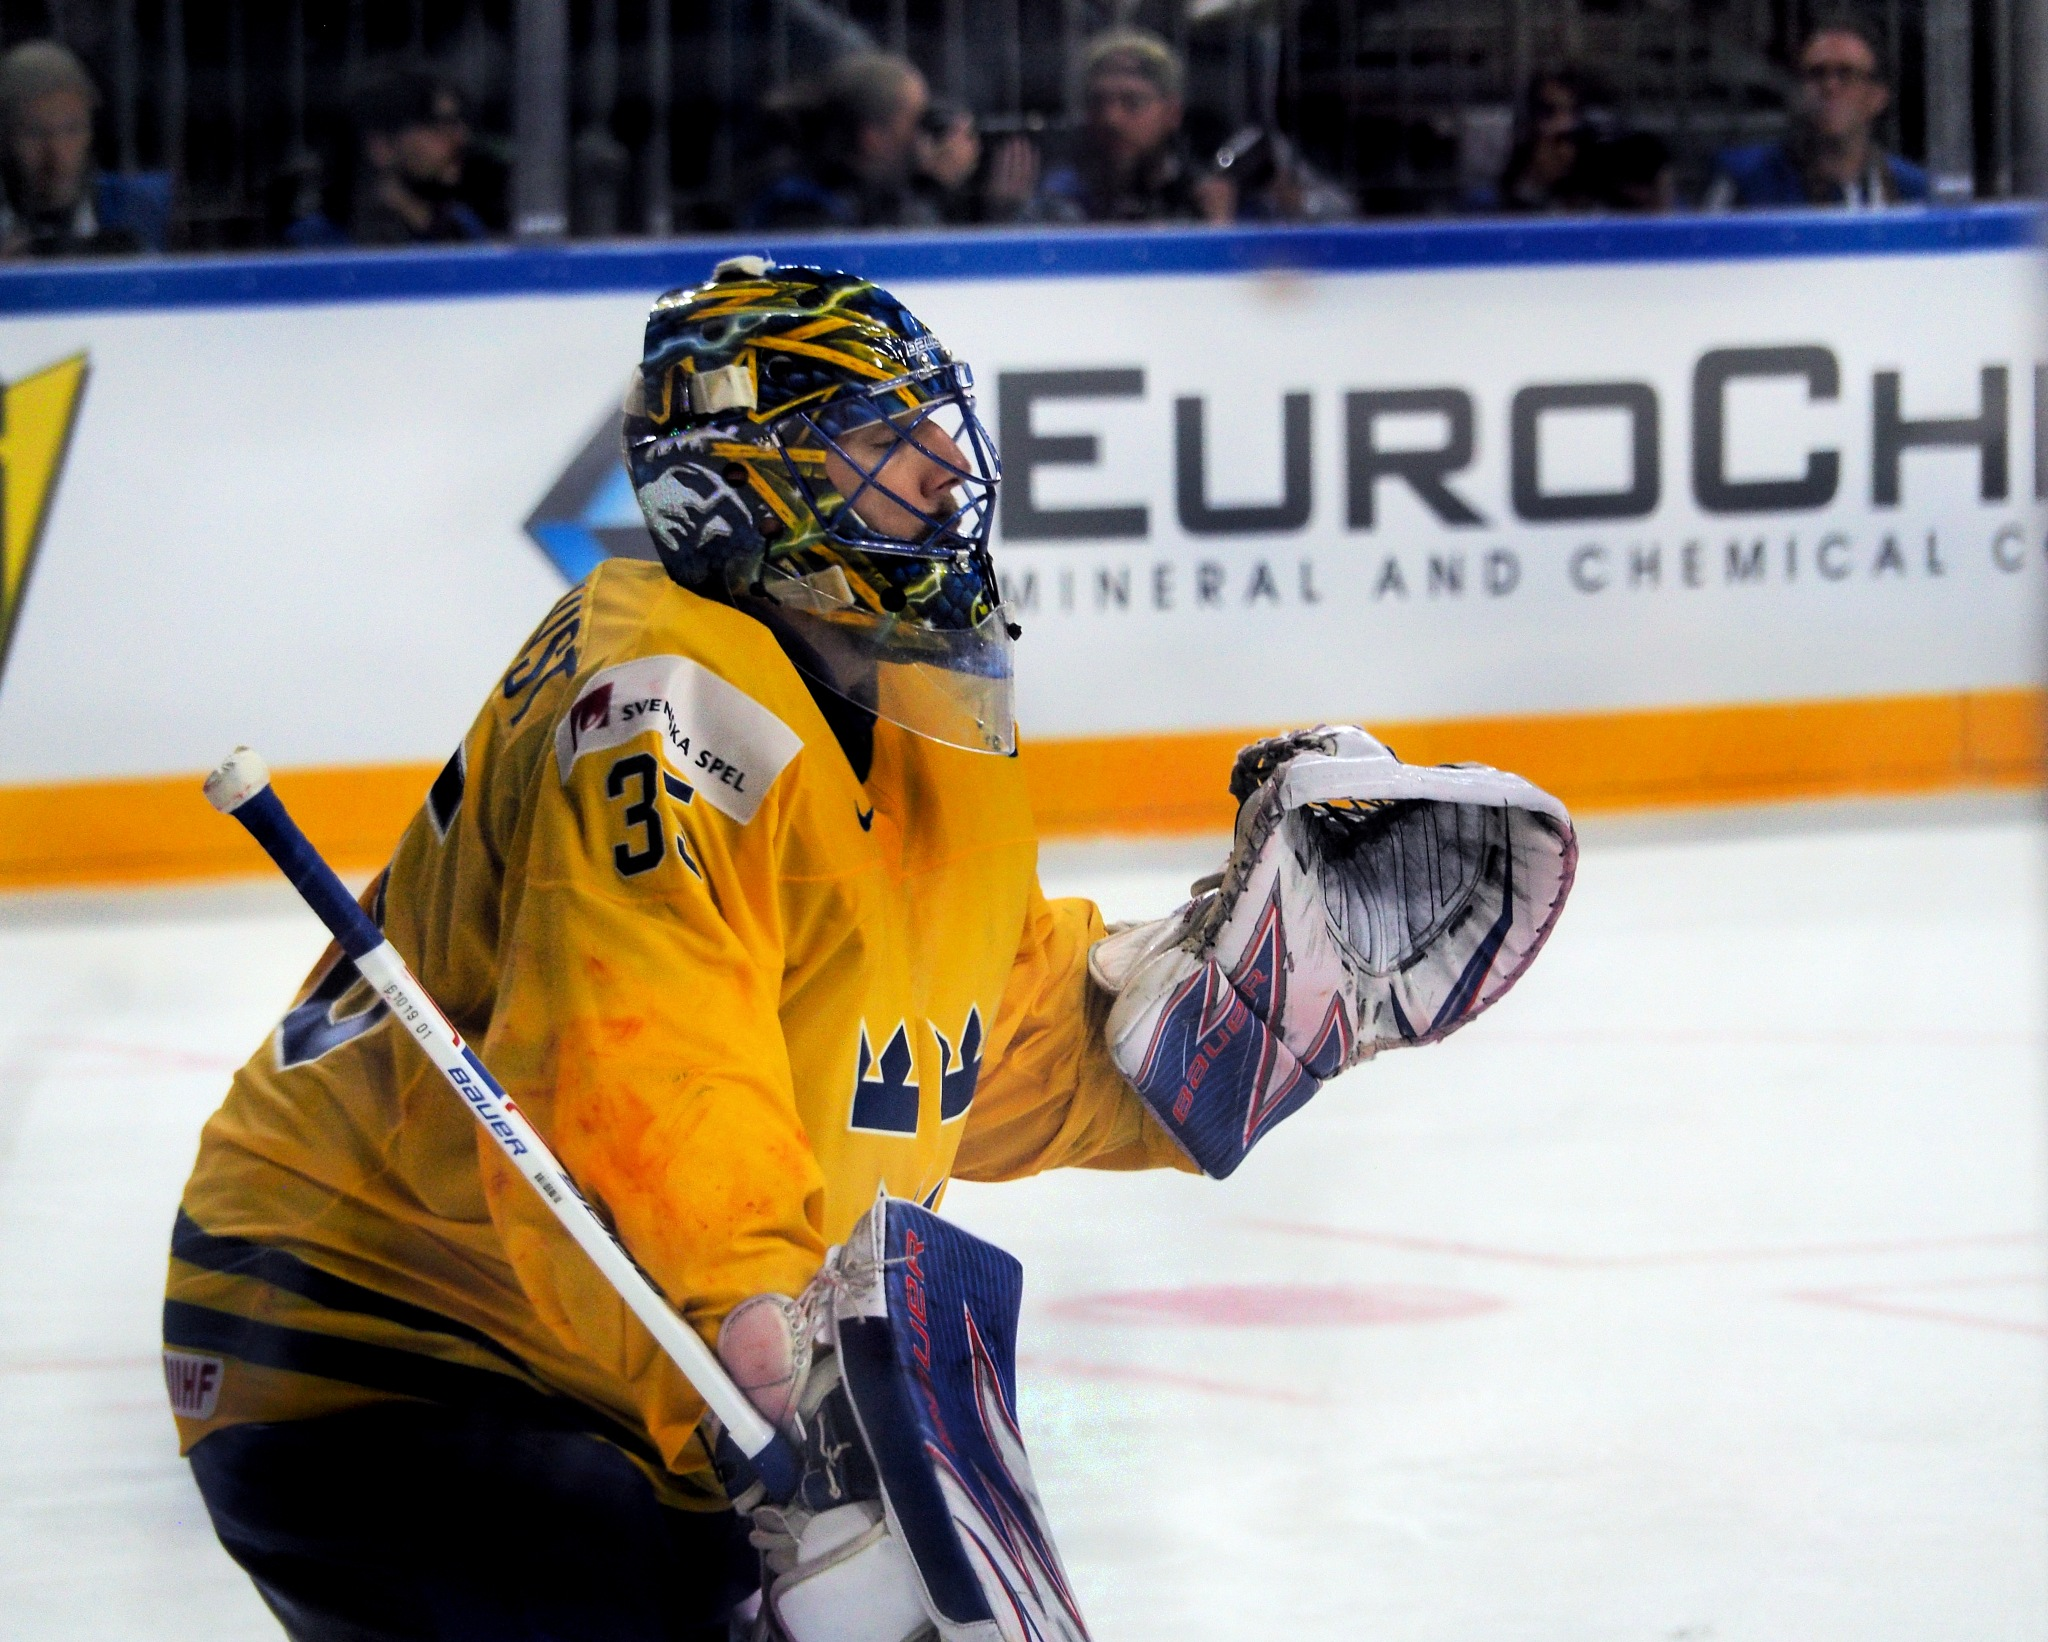 IIHF World Championship 2017 - The last penalty shot by Brigitte Bohlscheid